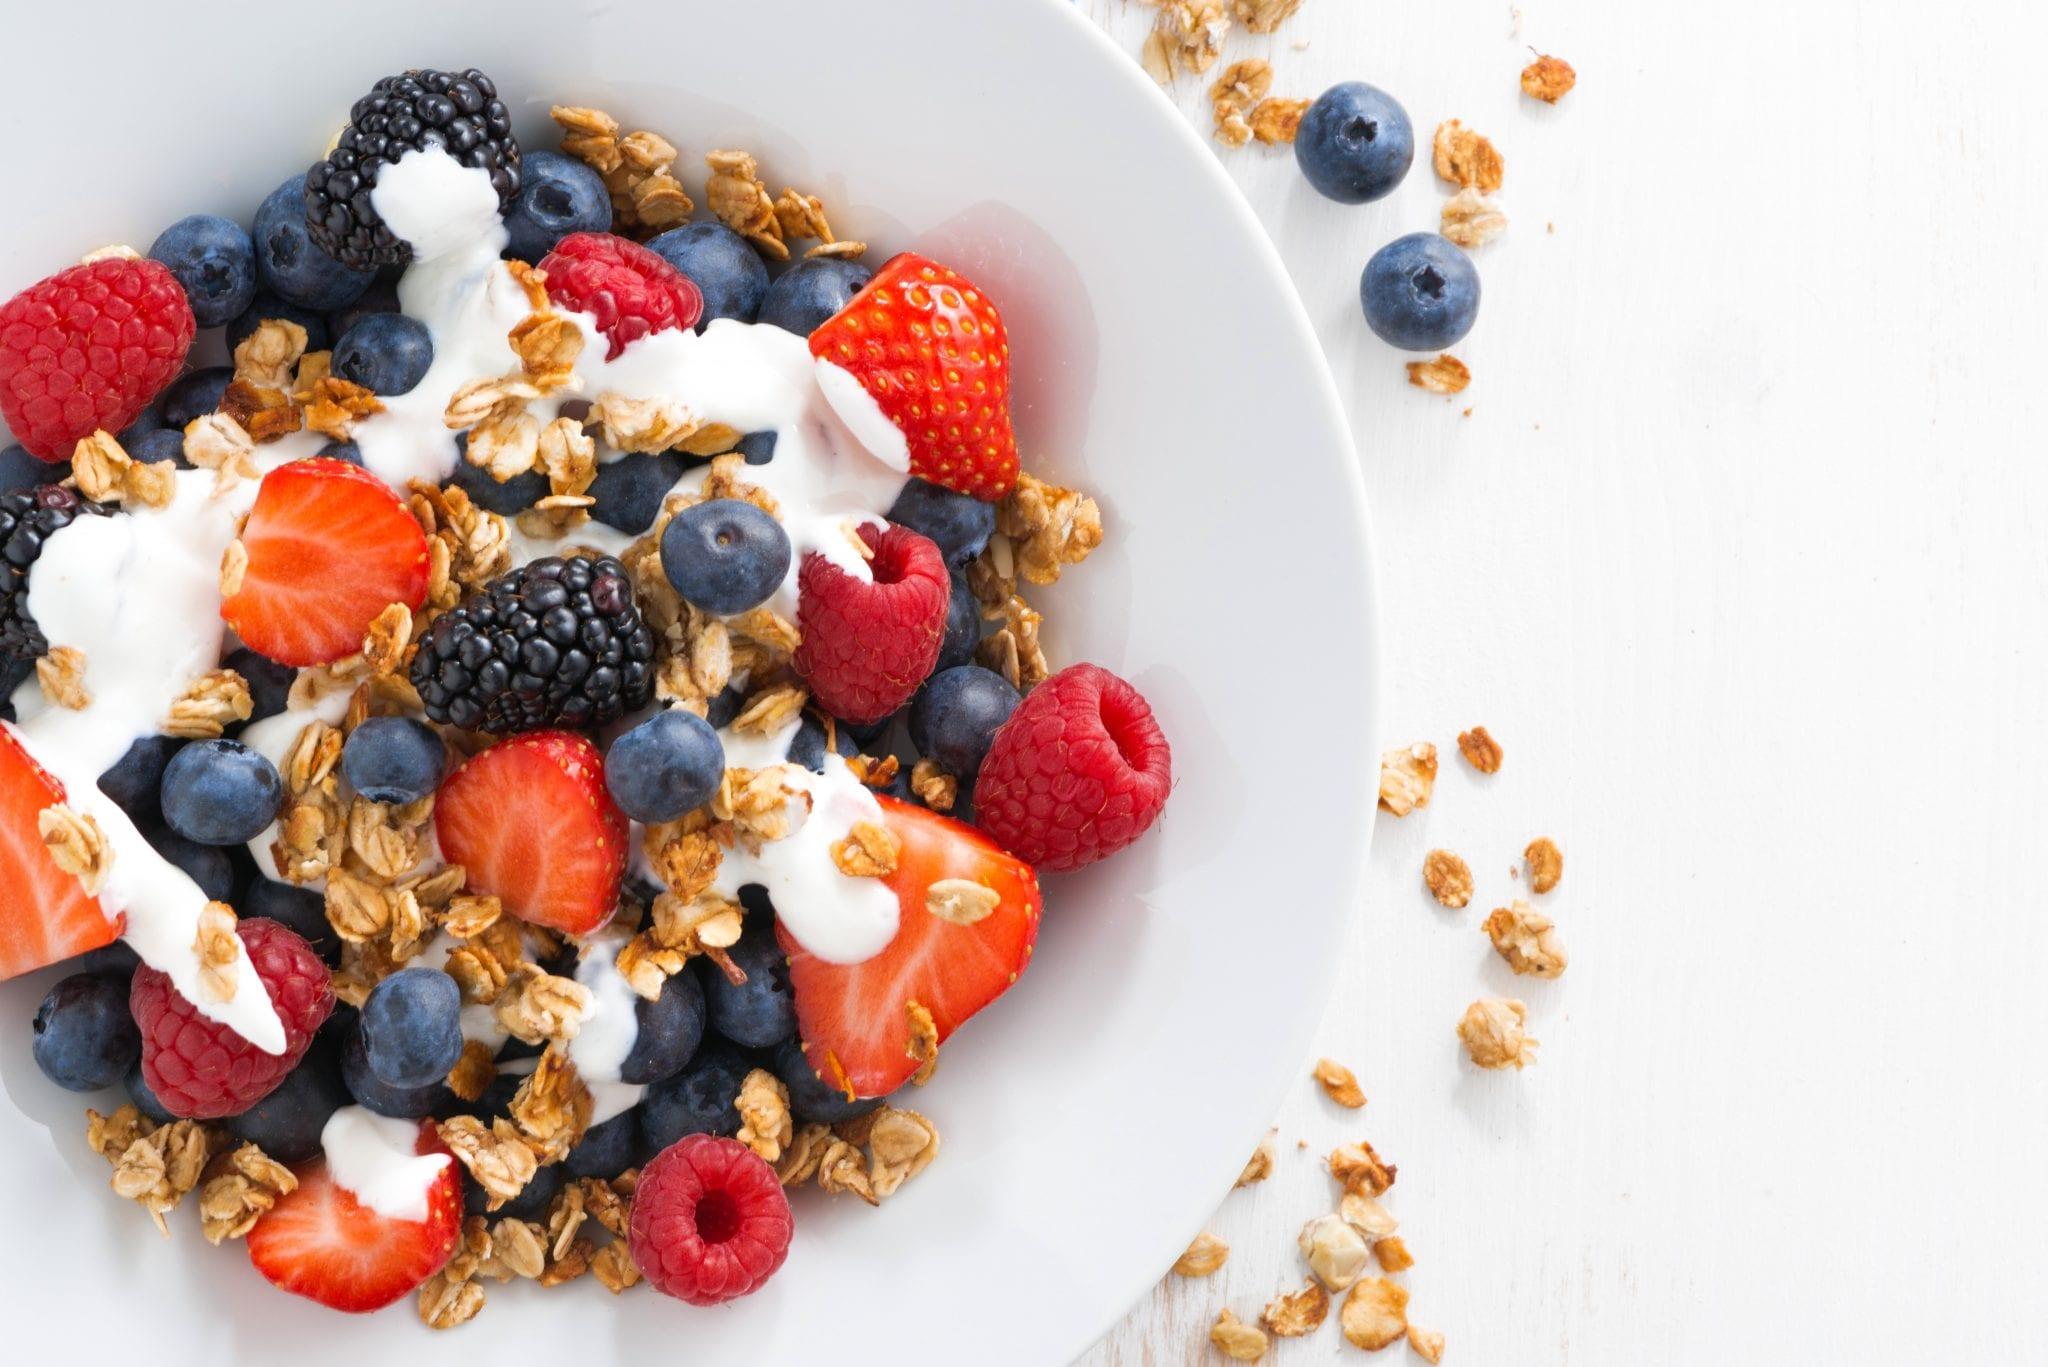 BenFit - gezonde leefstijl - yoghurt | Monné Fitness Breda